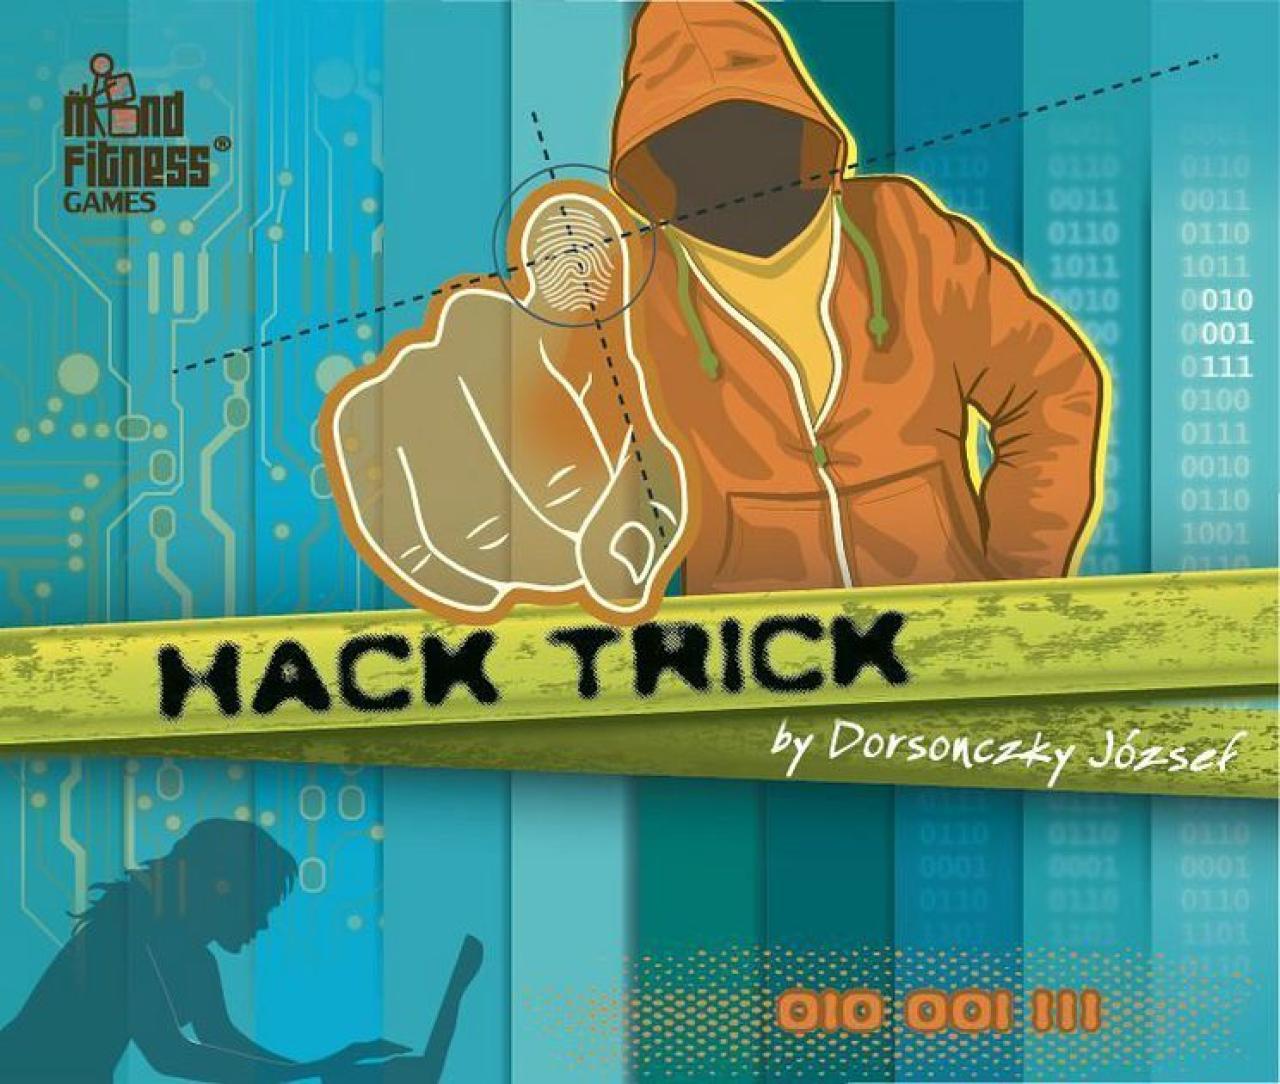 MMDSZ Diáknapok Hack trick